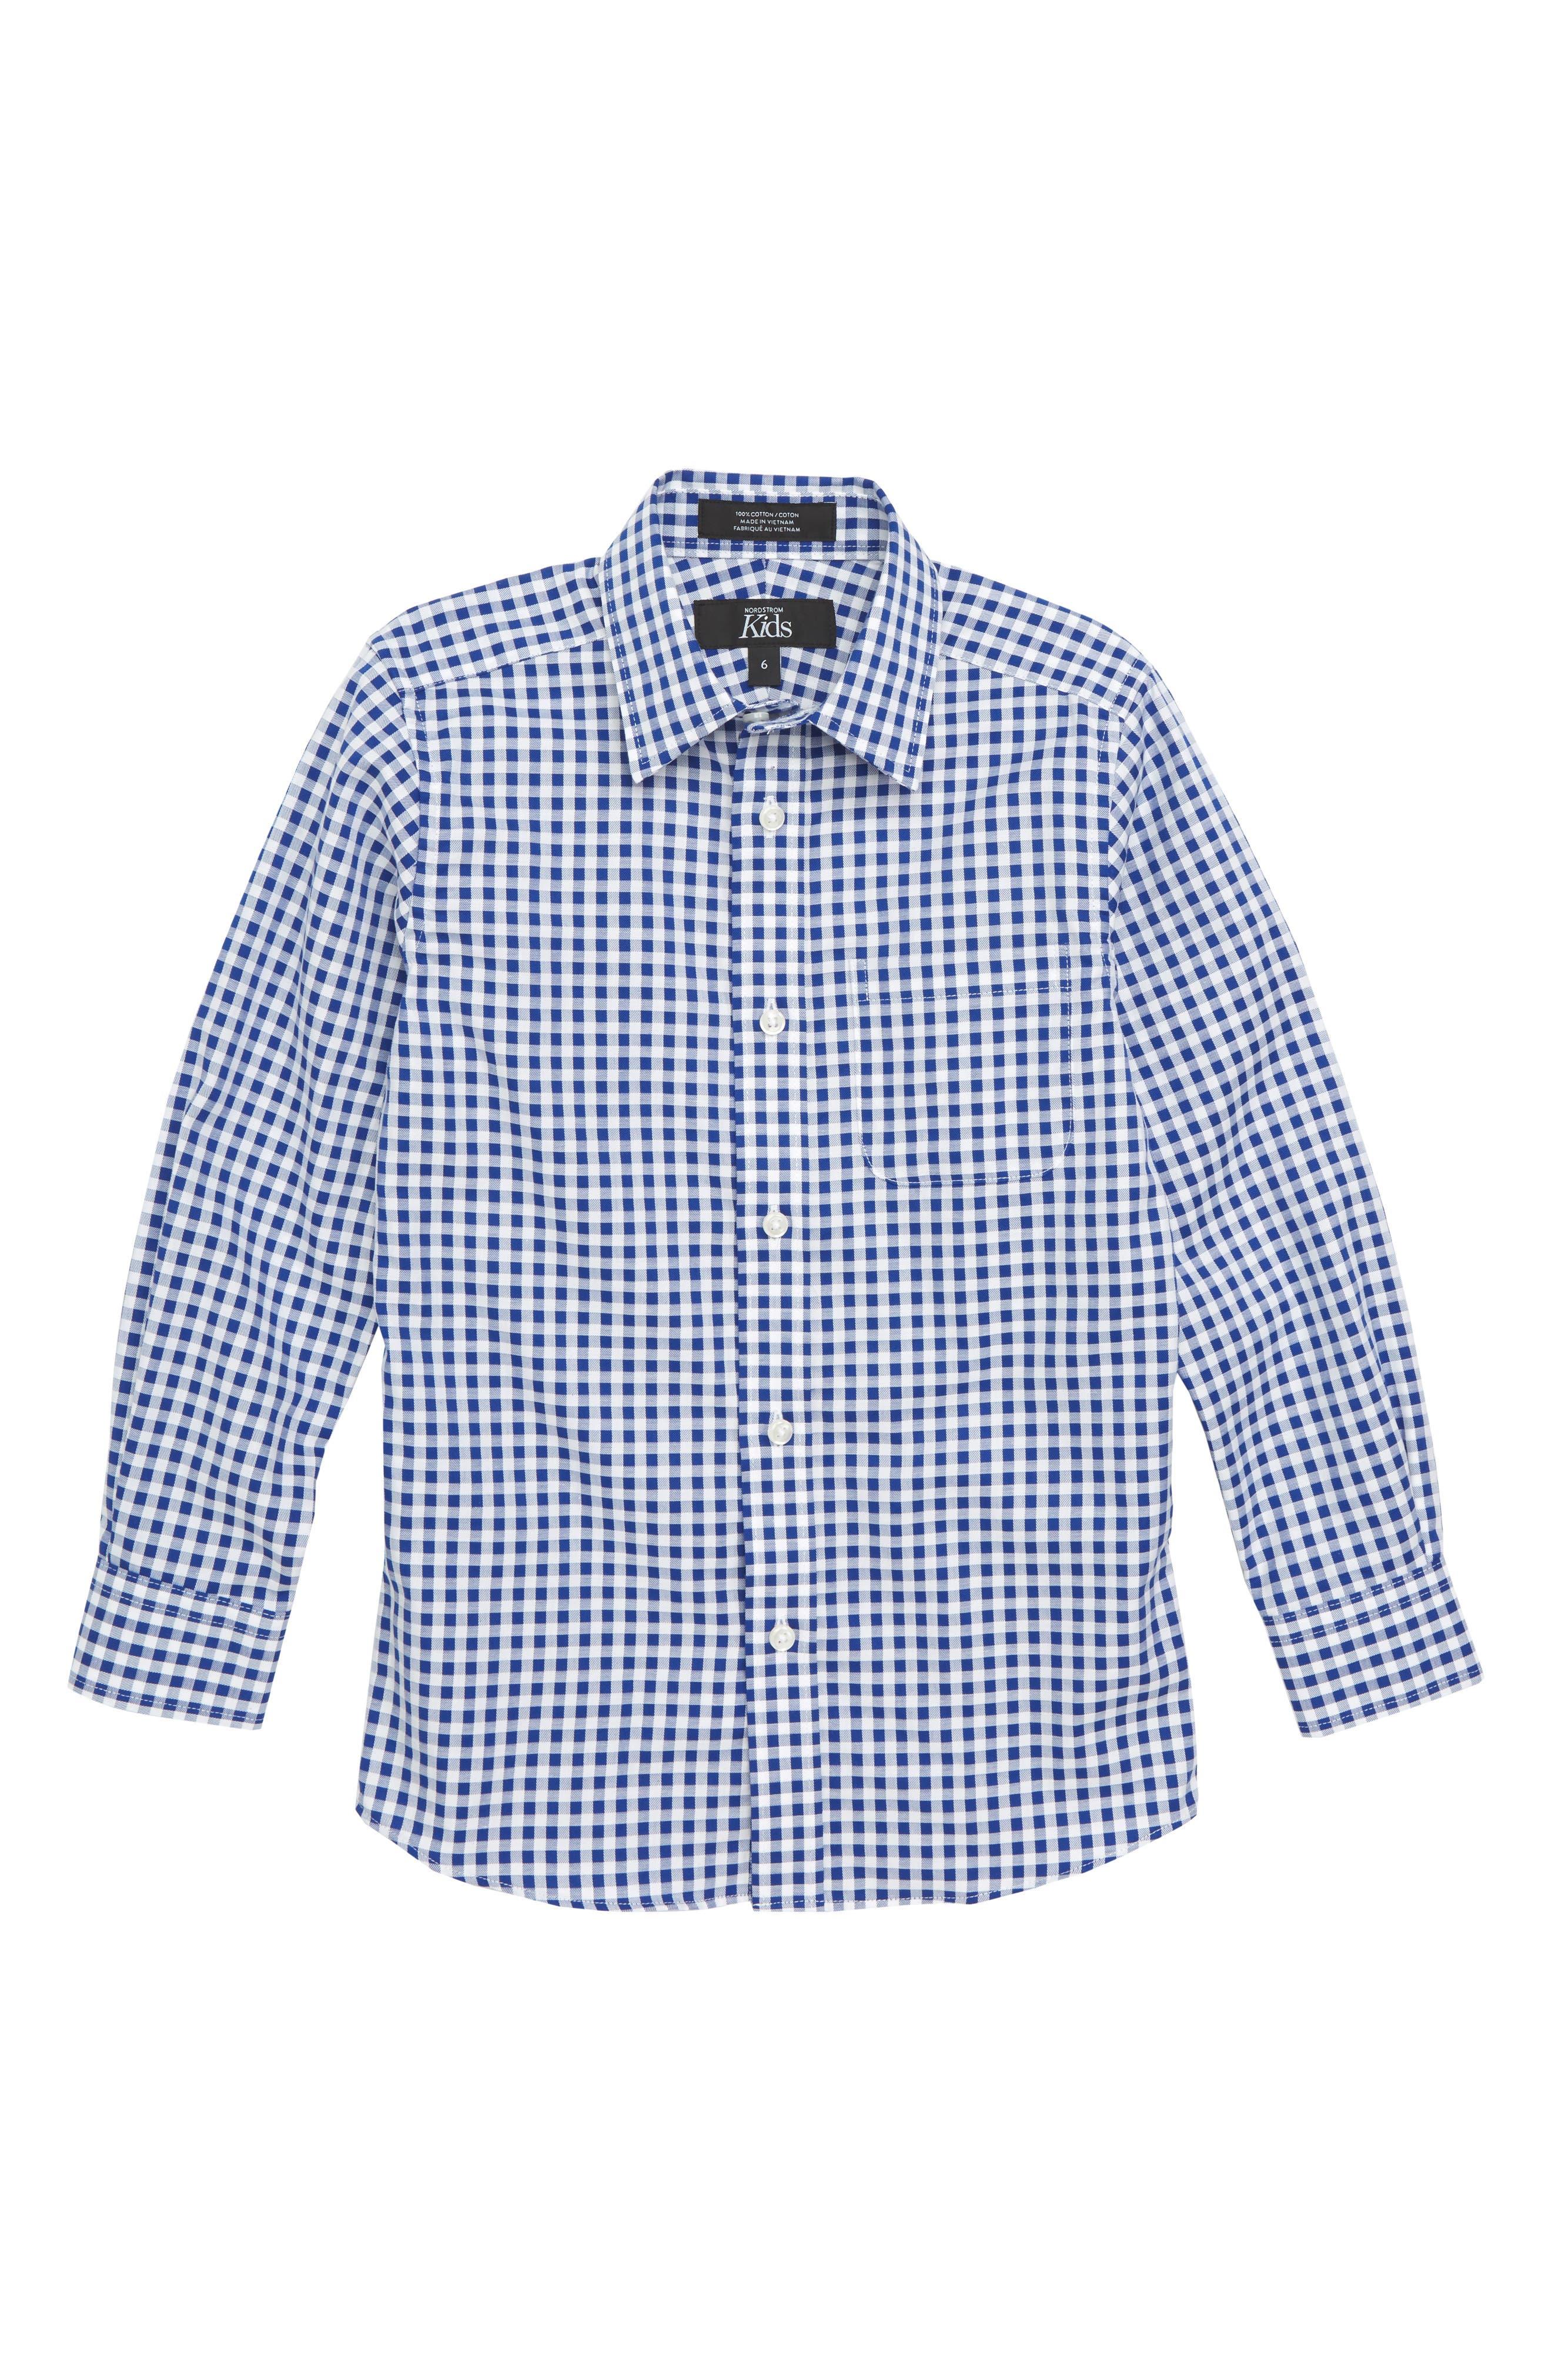 Check Dress Shirt,                             Main thumbnail 1, color,                             Blue Mazarine- White Check